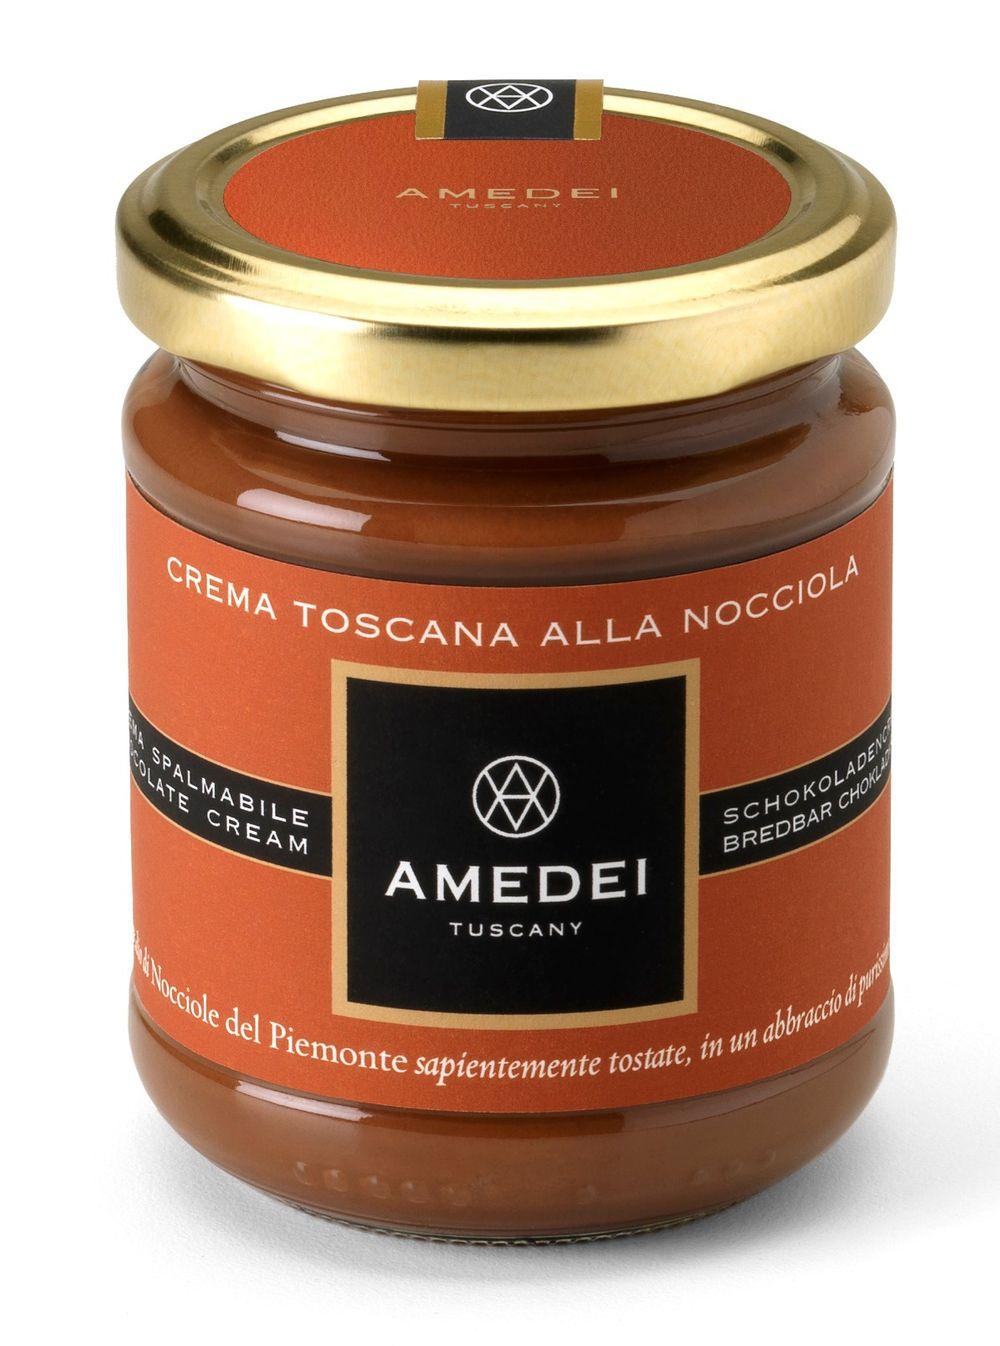 Crema Toscana Alla Nocciola Gianduja - Milk Chocolate